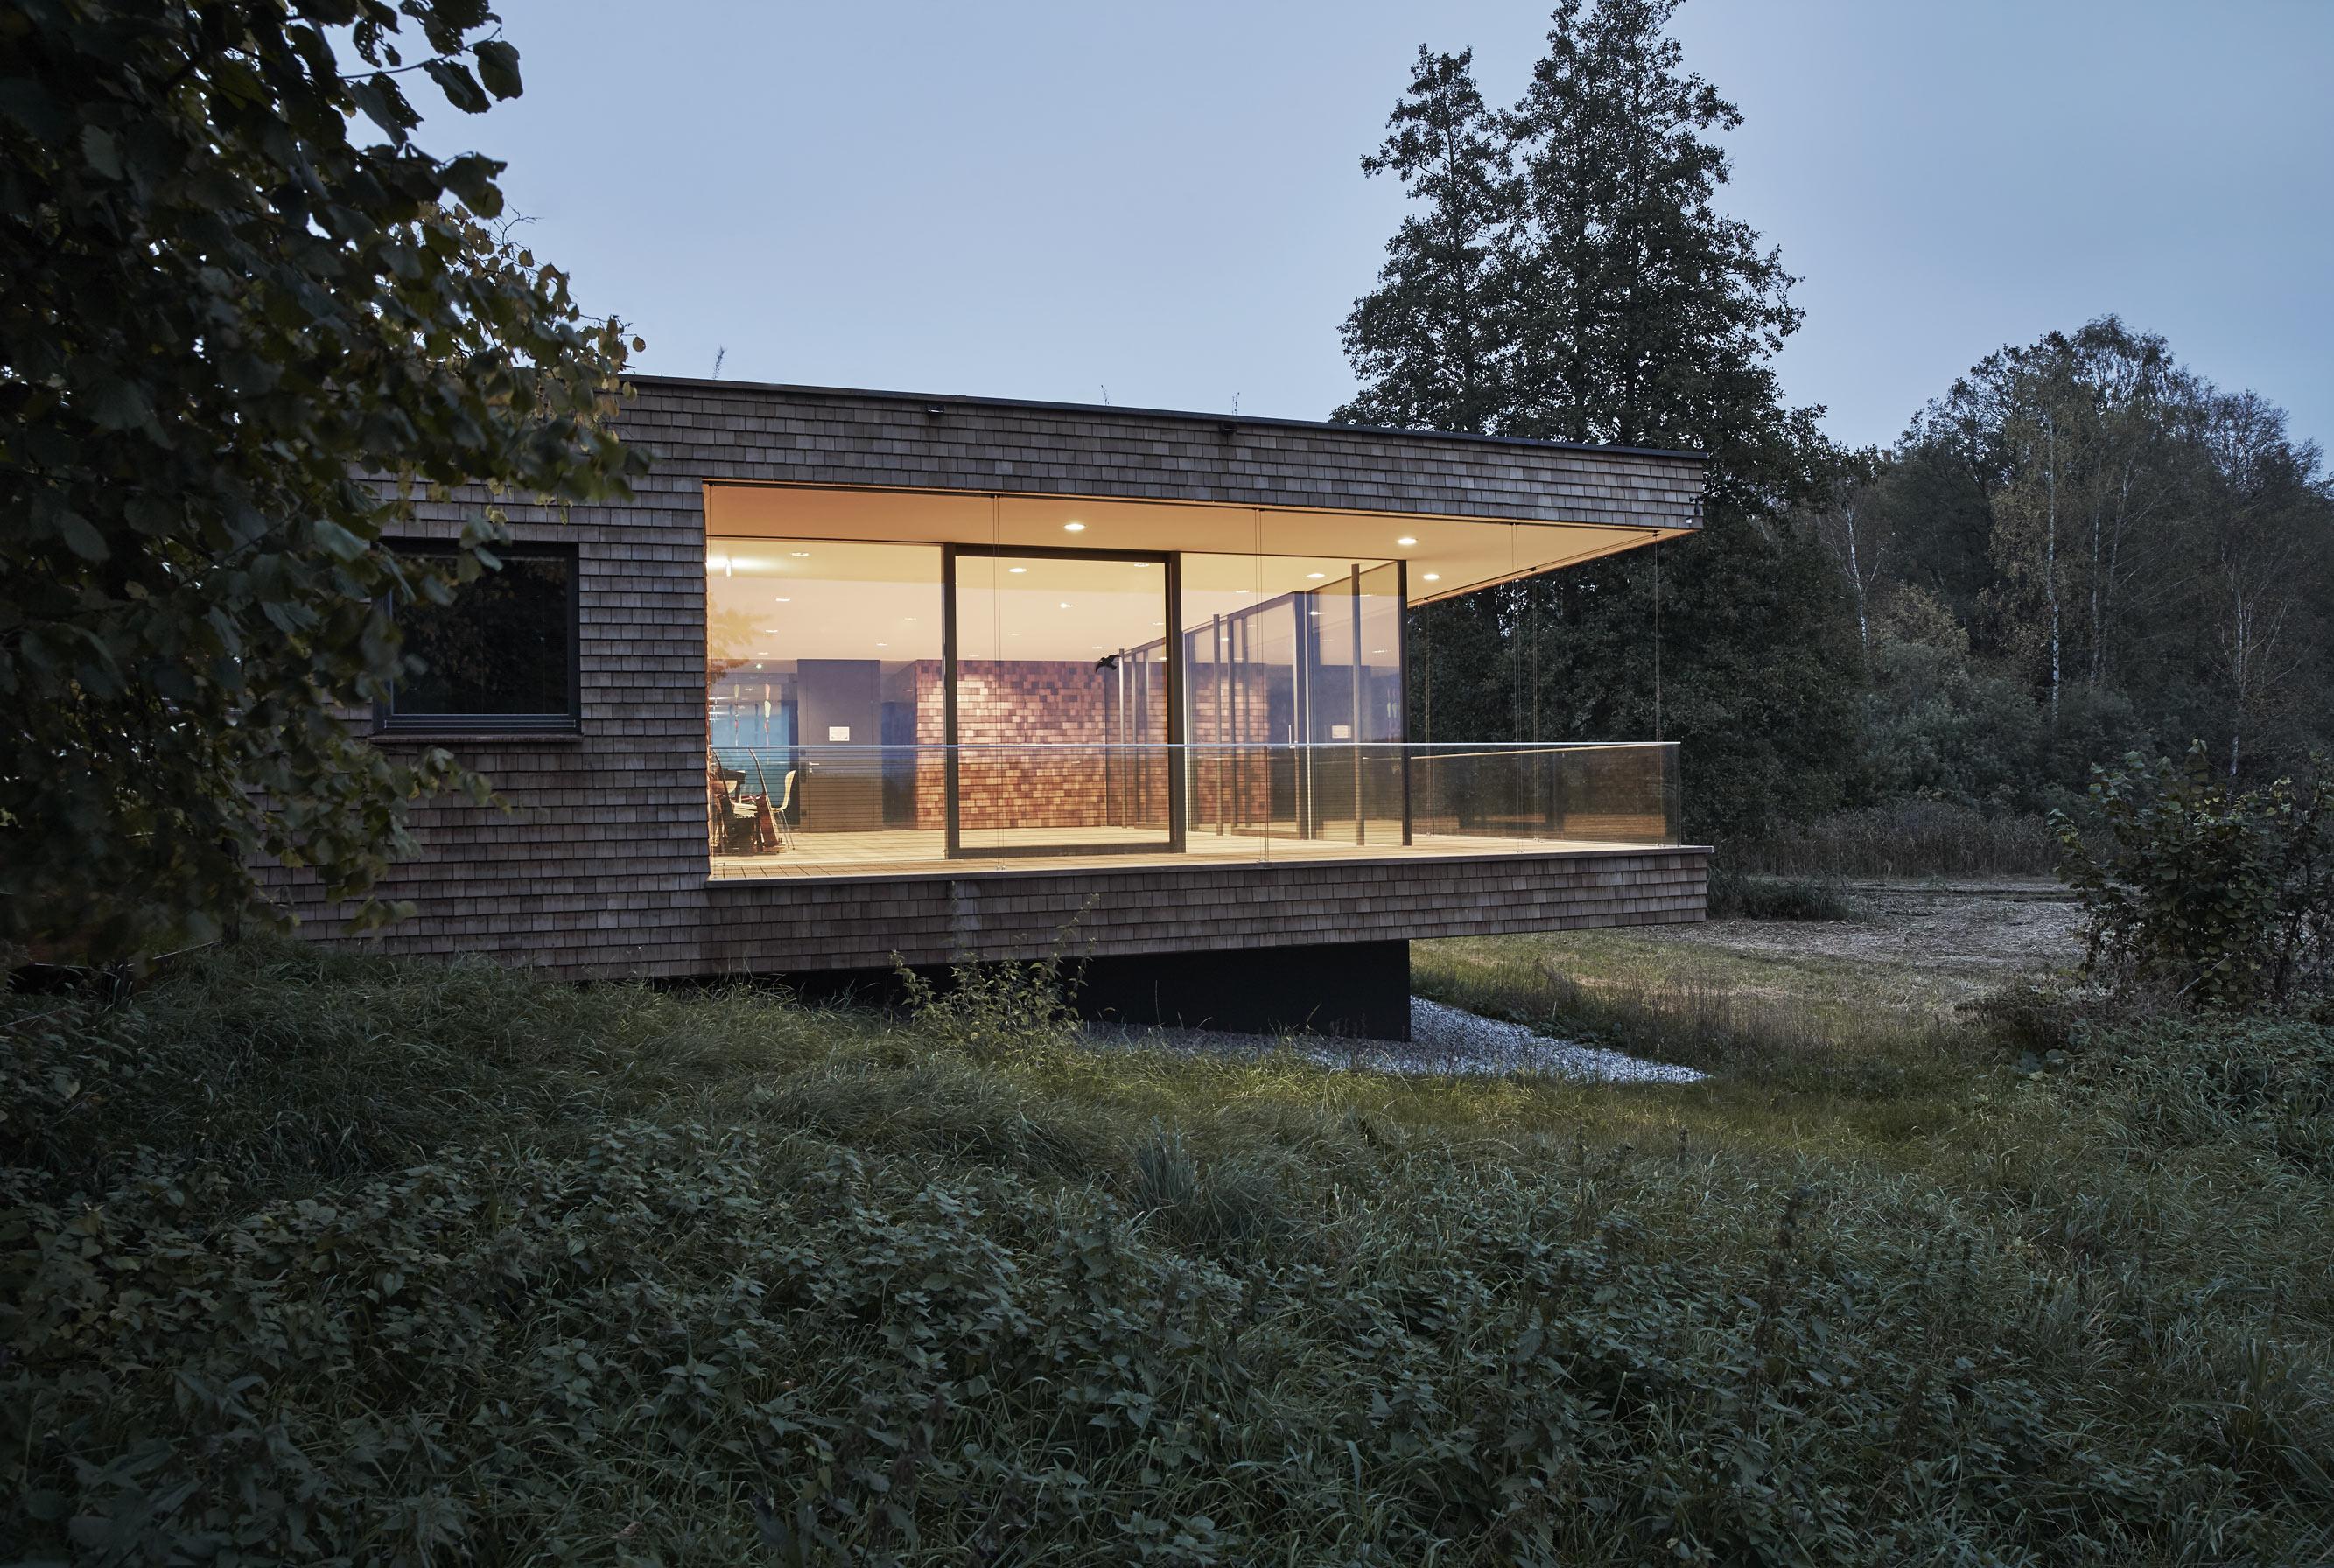 news vom architekt aus starnberg tutzing feldafing wsm. Black Bedroom Furniture Sets. Home Design Ideas